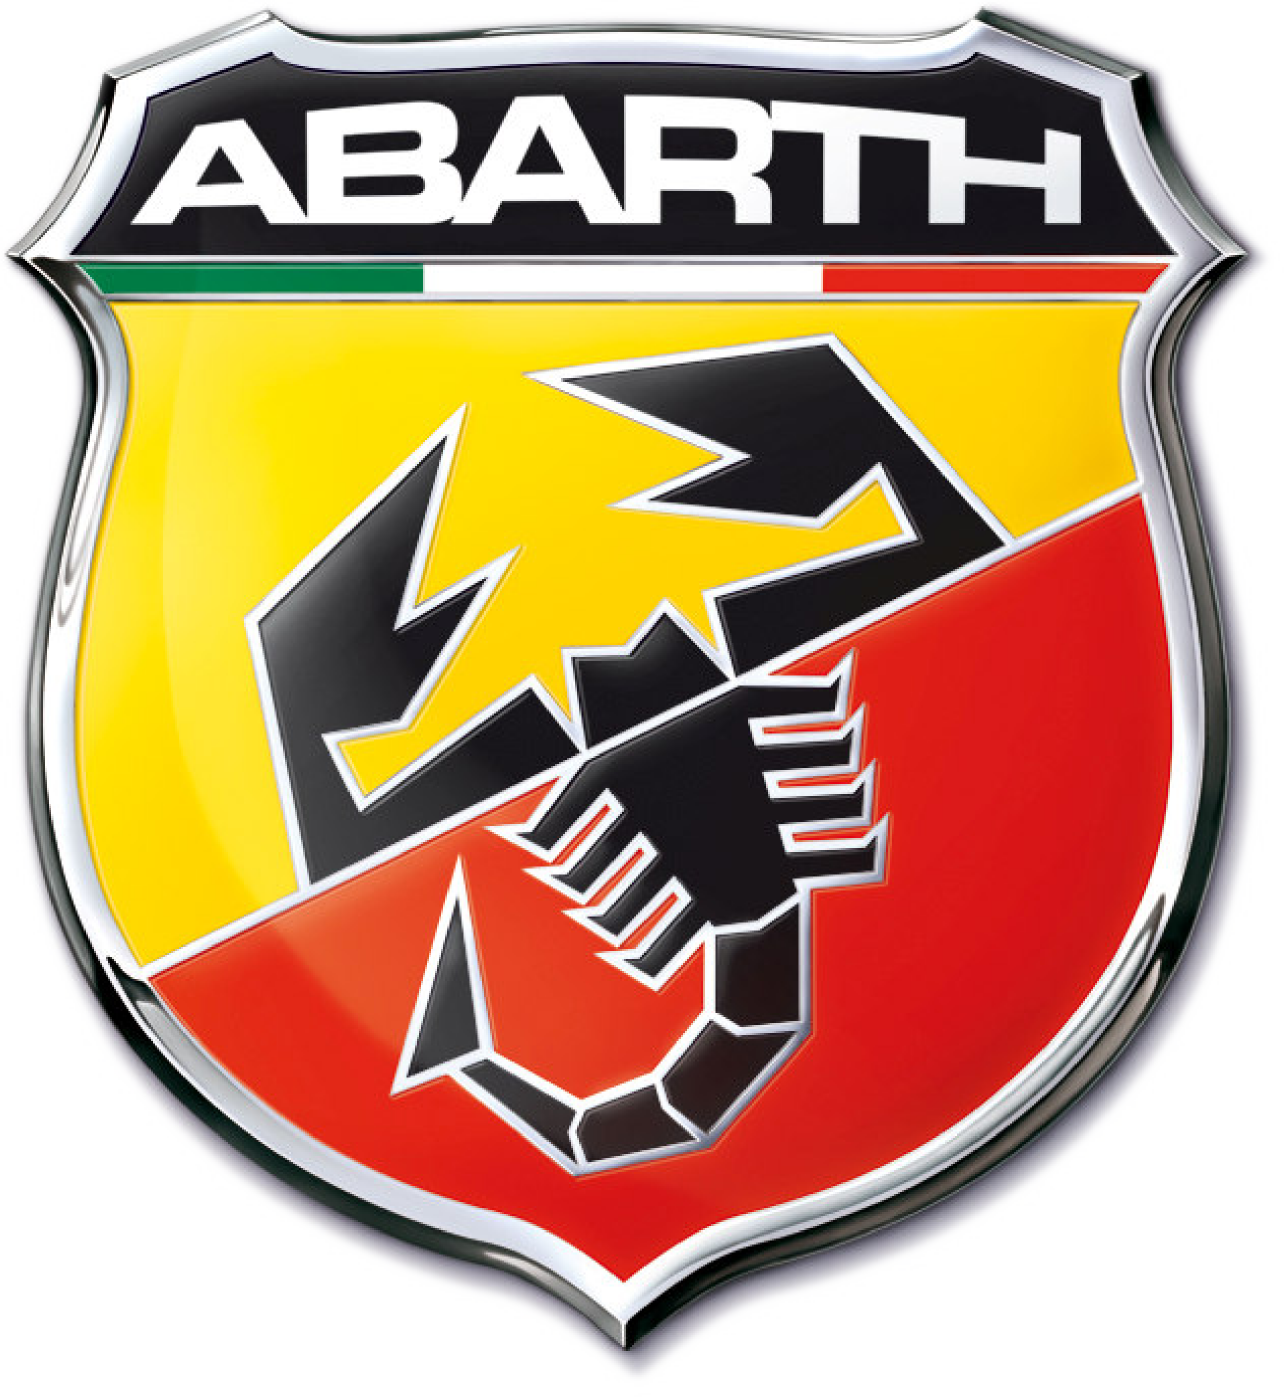 http://upload.wikimedia.org/wikipedia/de/3/3c/Abarth_logo.png